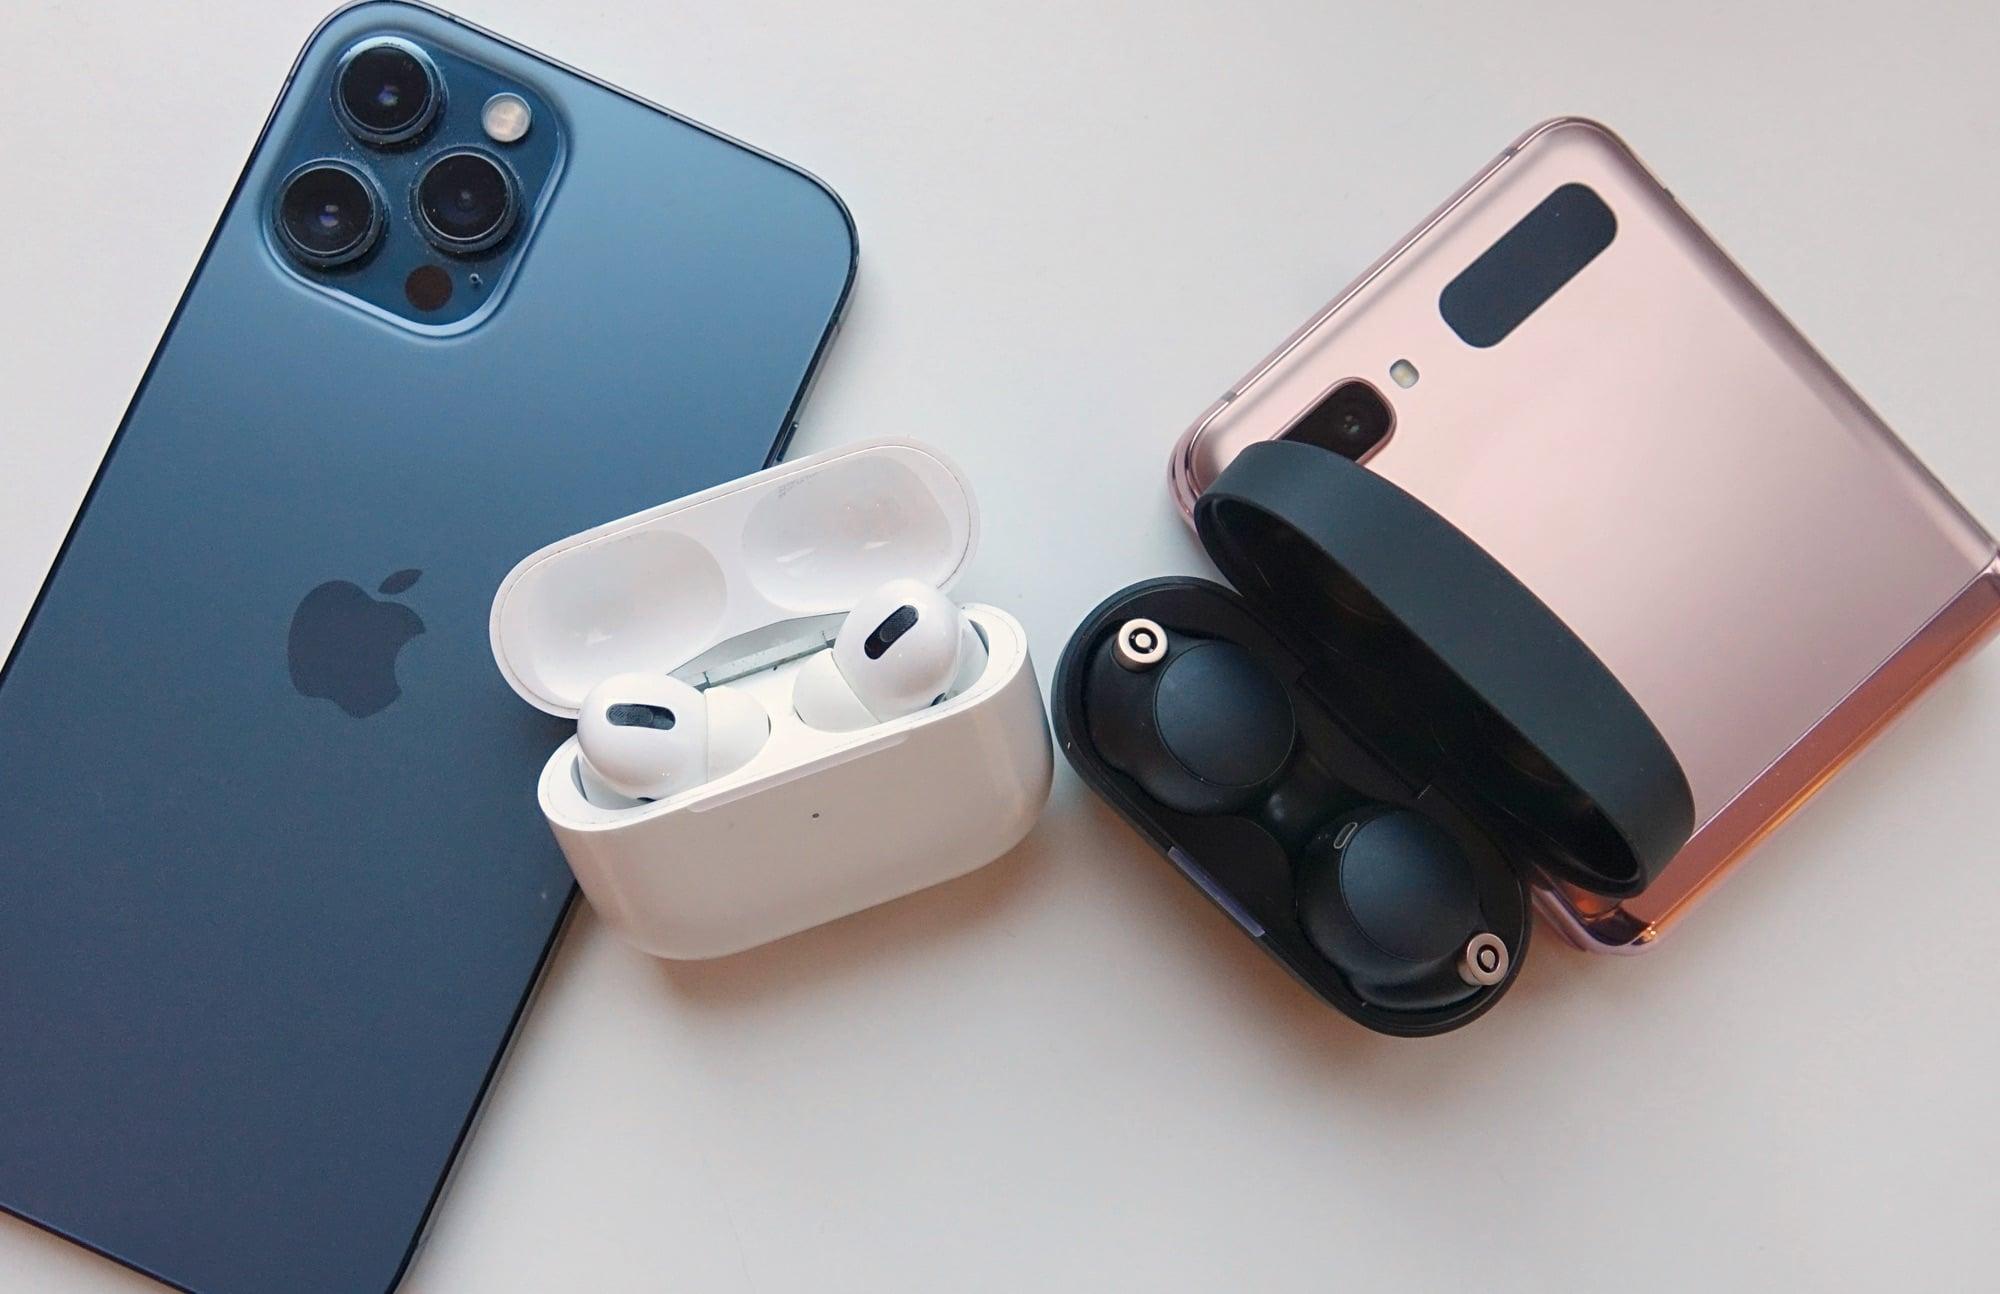 Apple AirPods Pro vs Sony WF-1000XM4